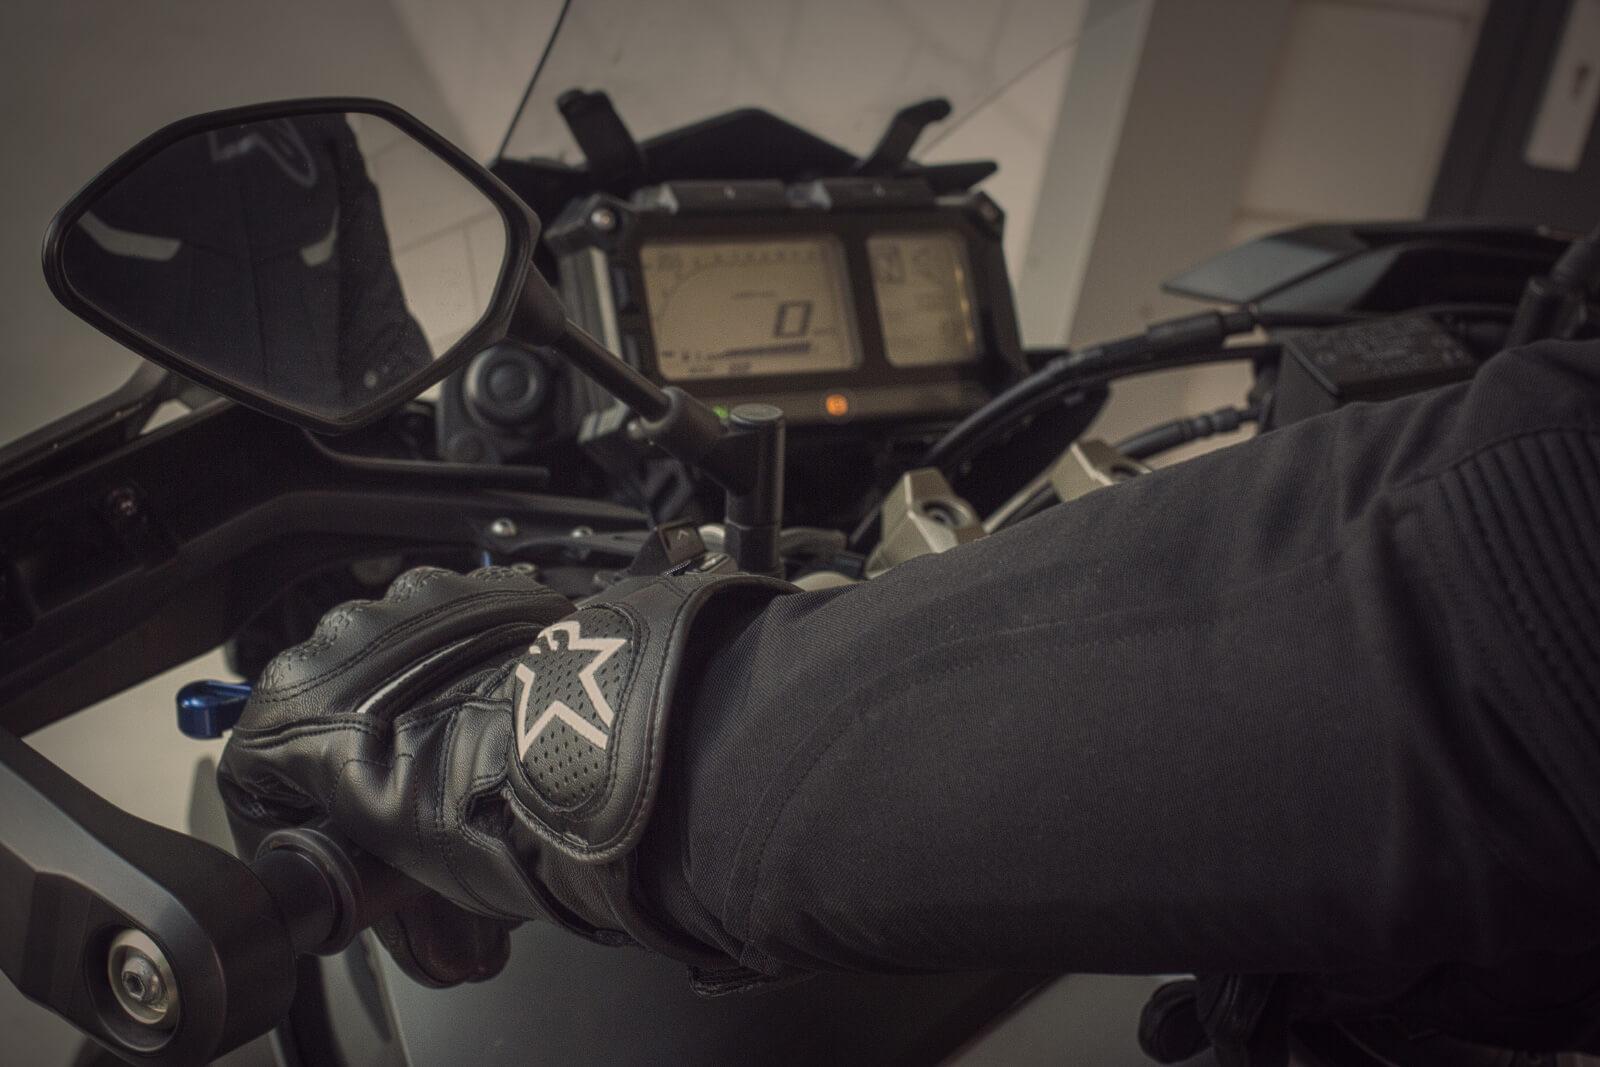 alpinestars SP-Z motorkledingcenter motoroutfit